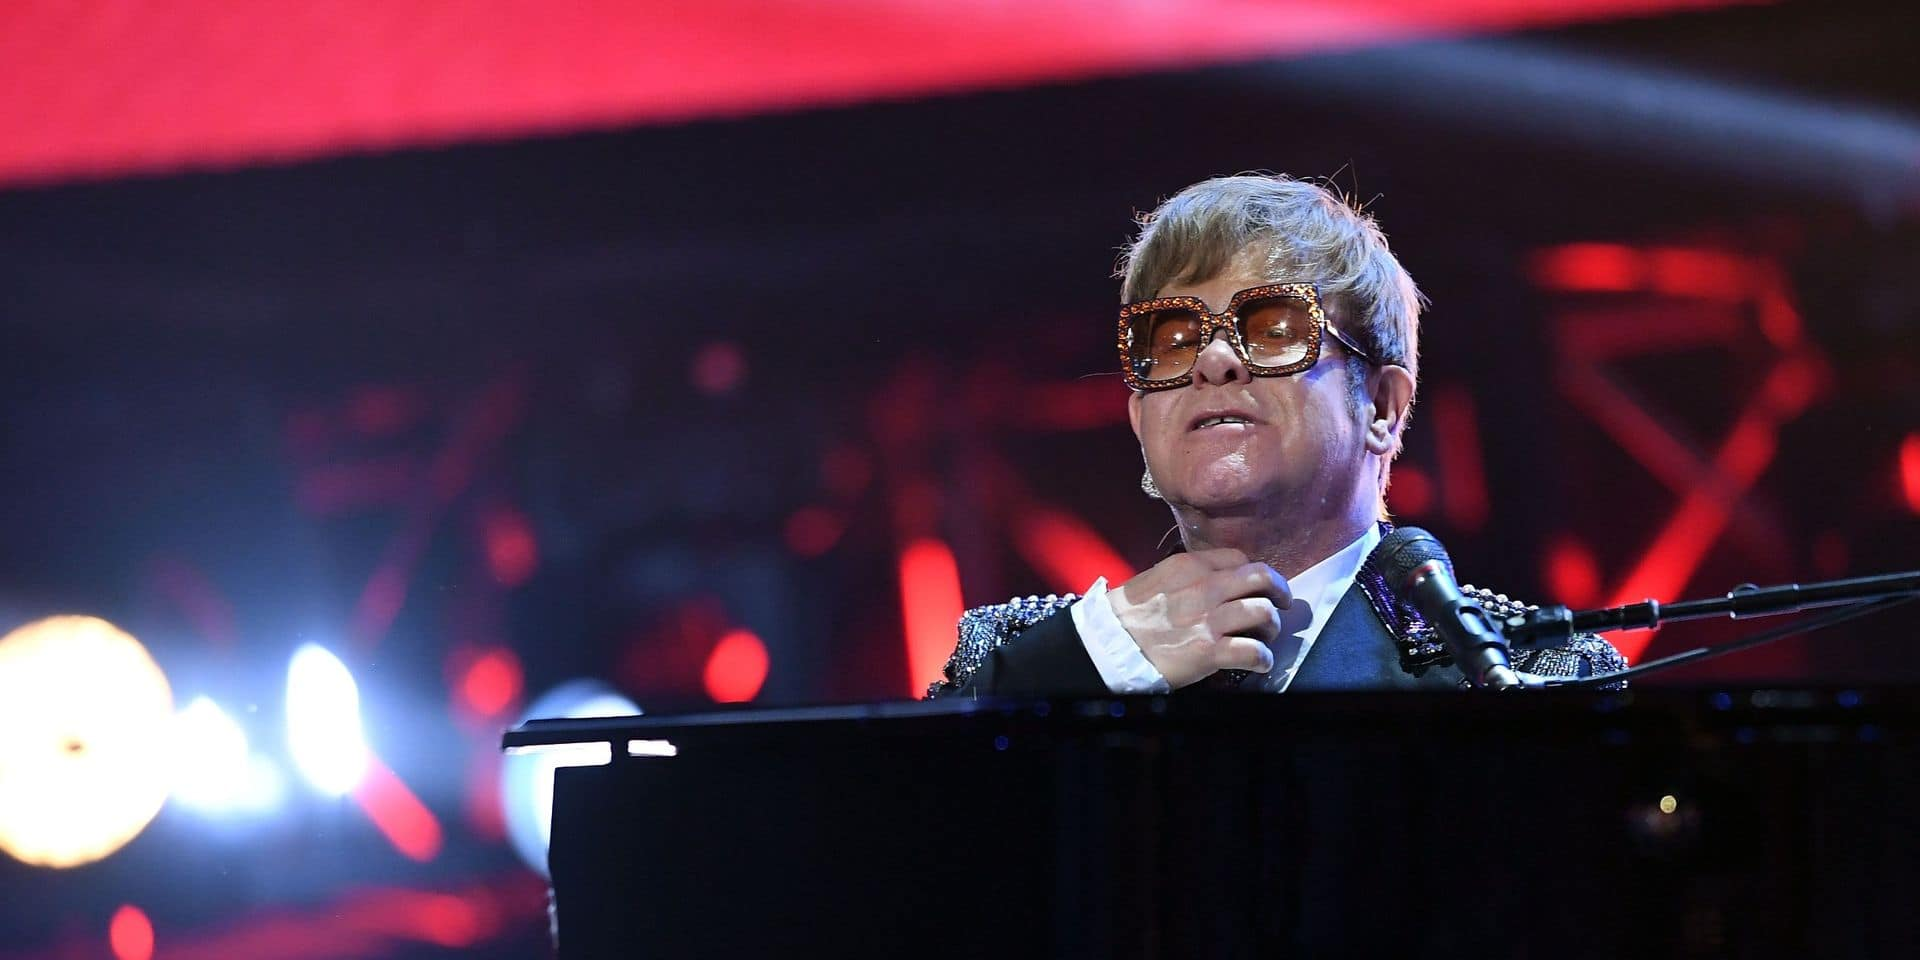 Malade, Elton John reporte plusieurs concerts